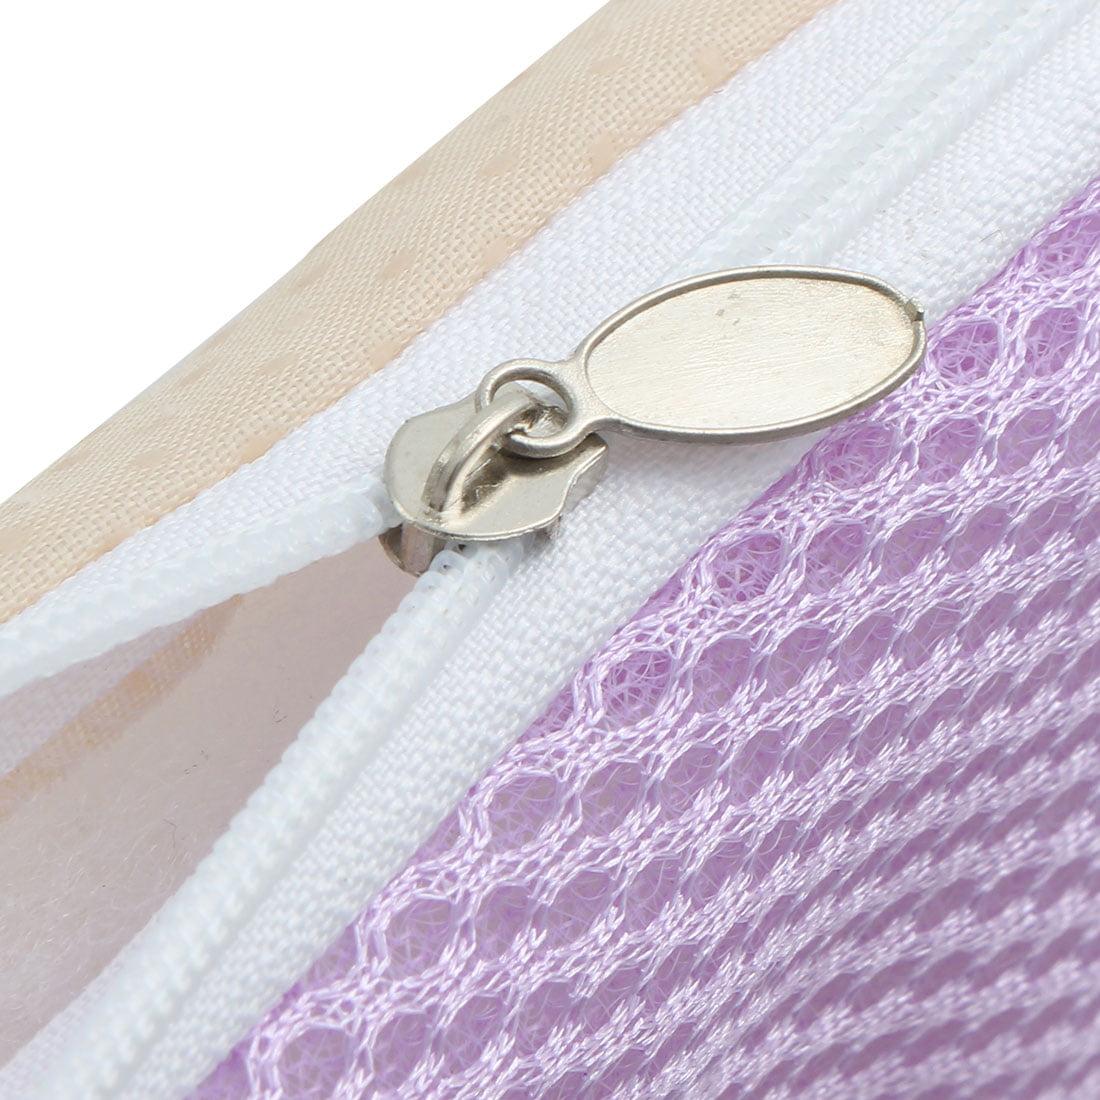 Home Office Polyester Square Chair Sofa Cushion Pad Light Purple 40cm x 40cm - image 1 de 5